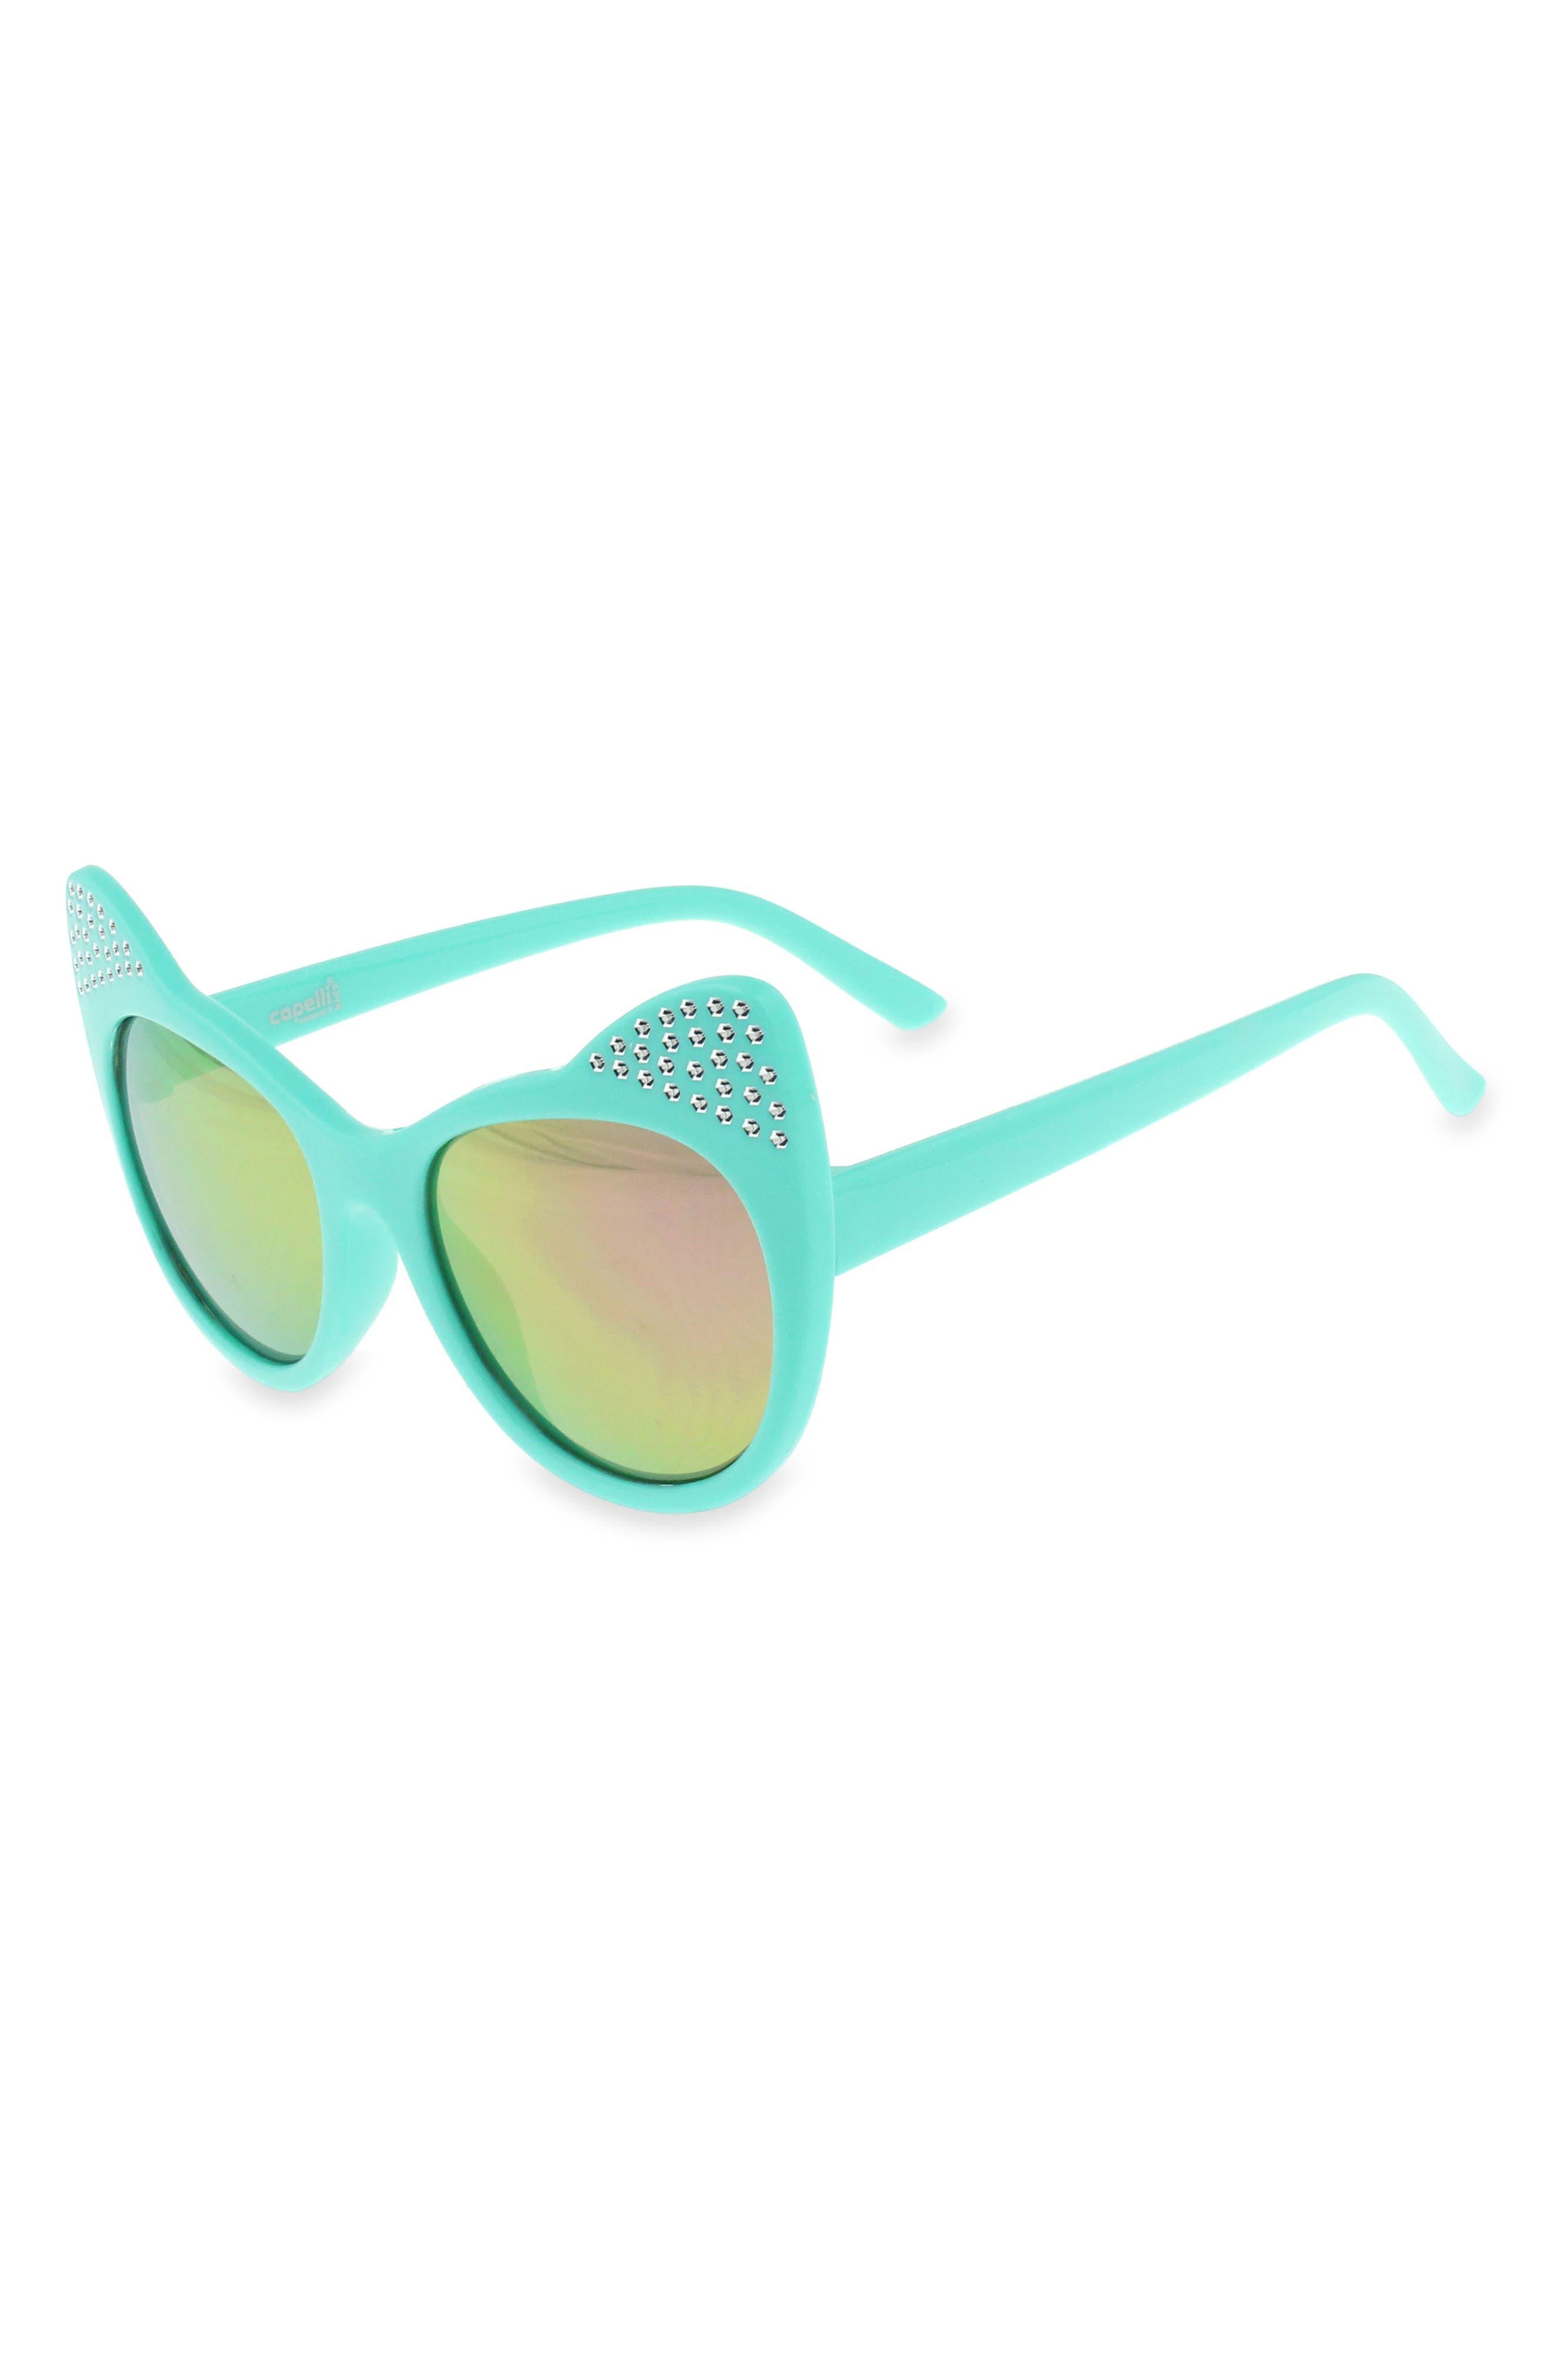 60mm Crystal Cat Ear Sunglasses,                         Main,                         color, 338